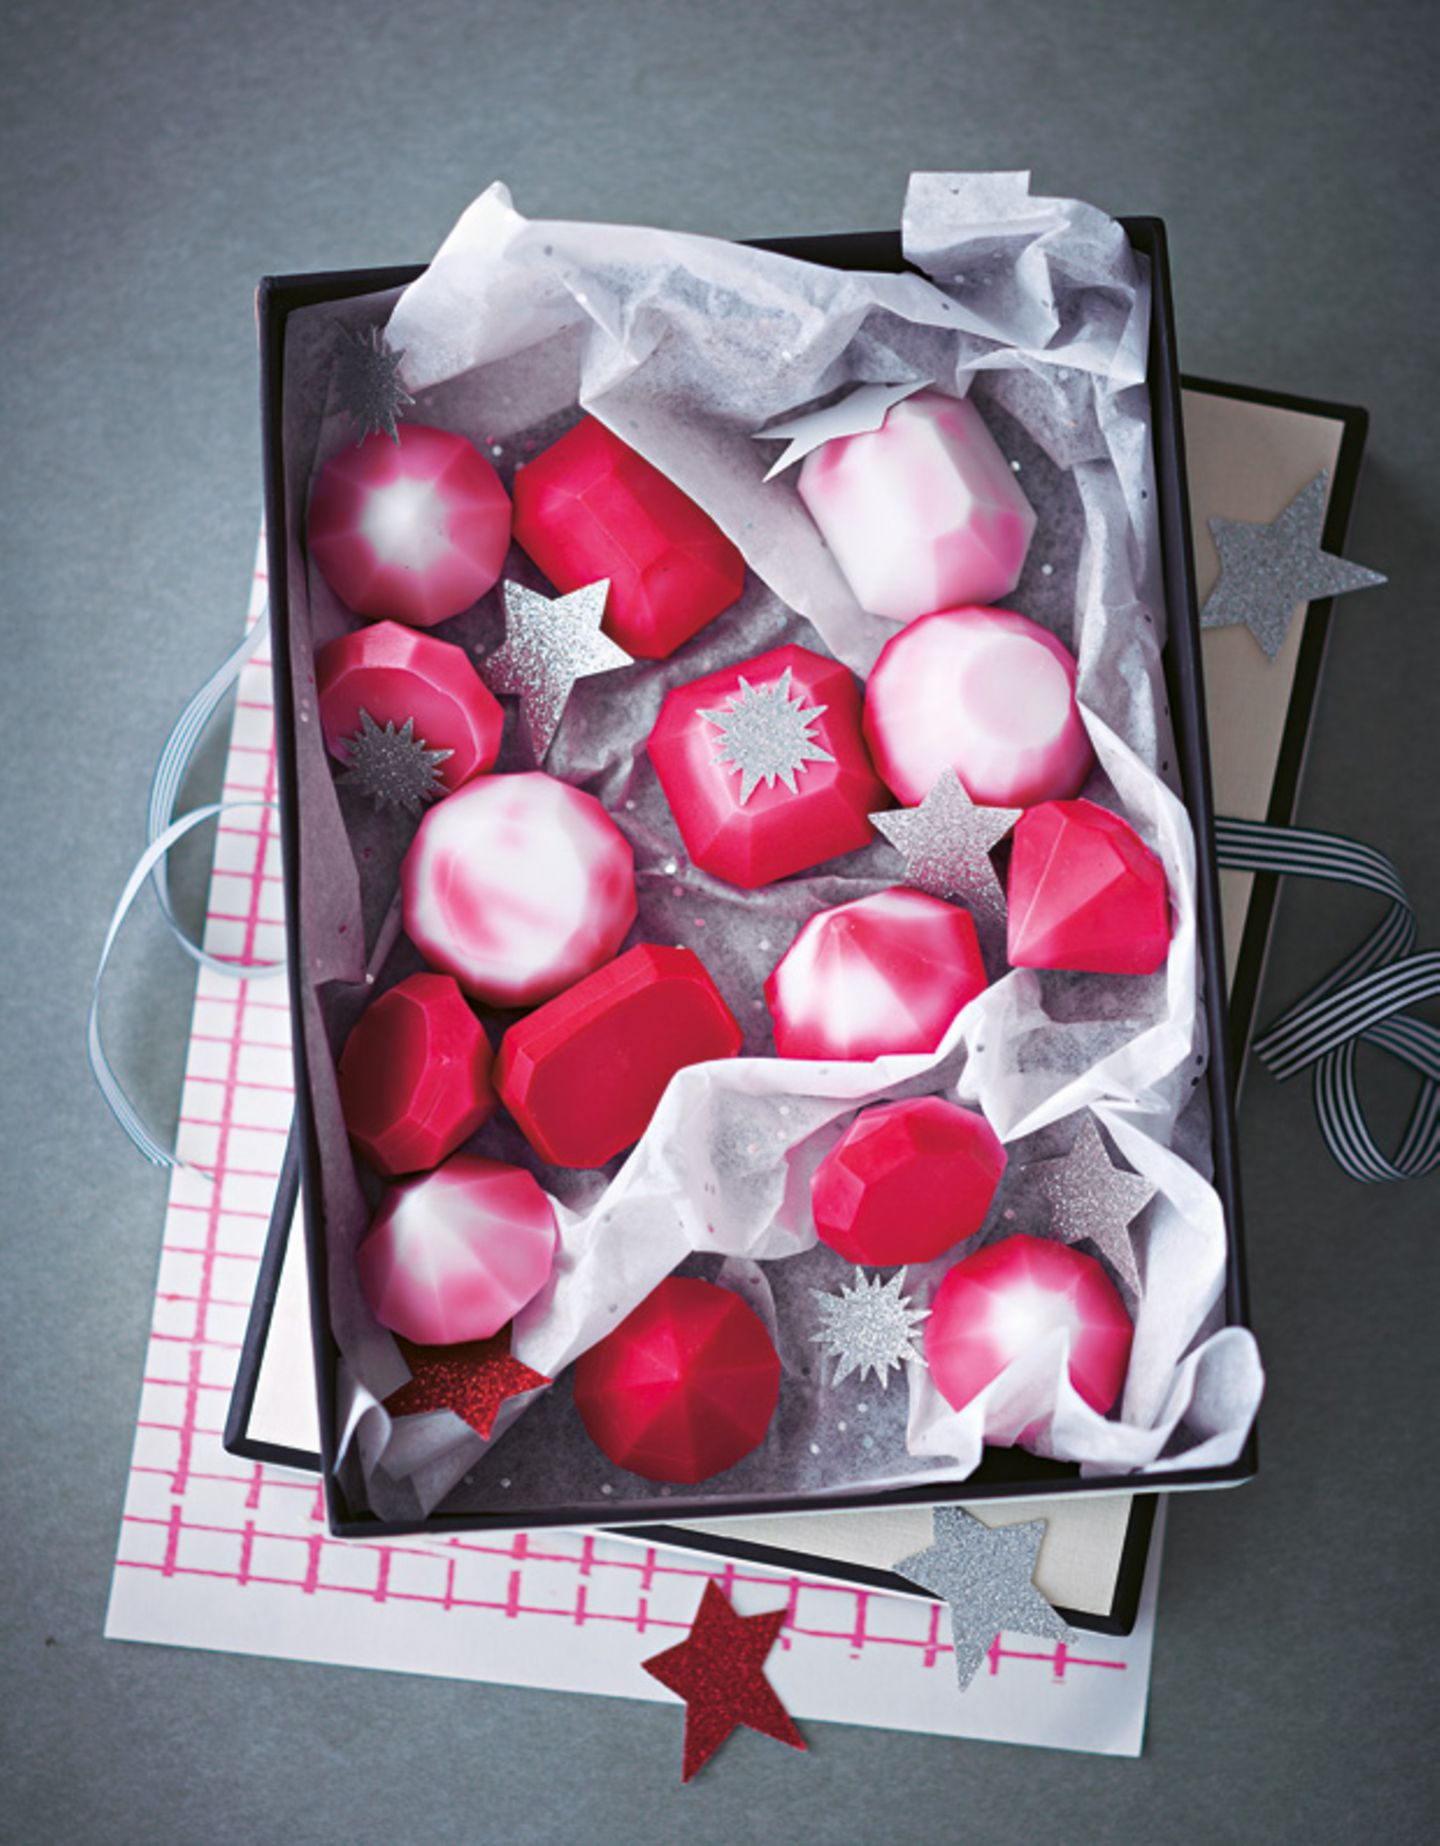 Seife selber machen - hübsche Geschenkidee